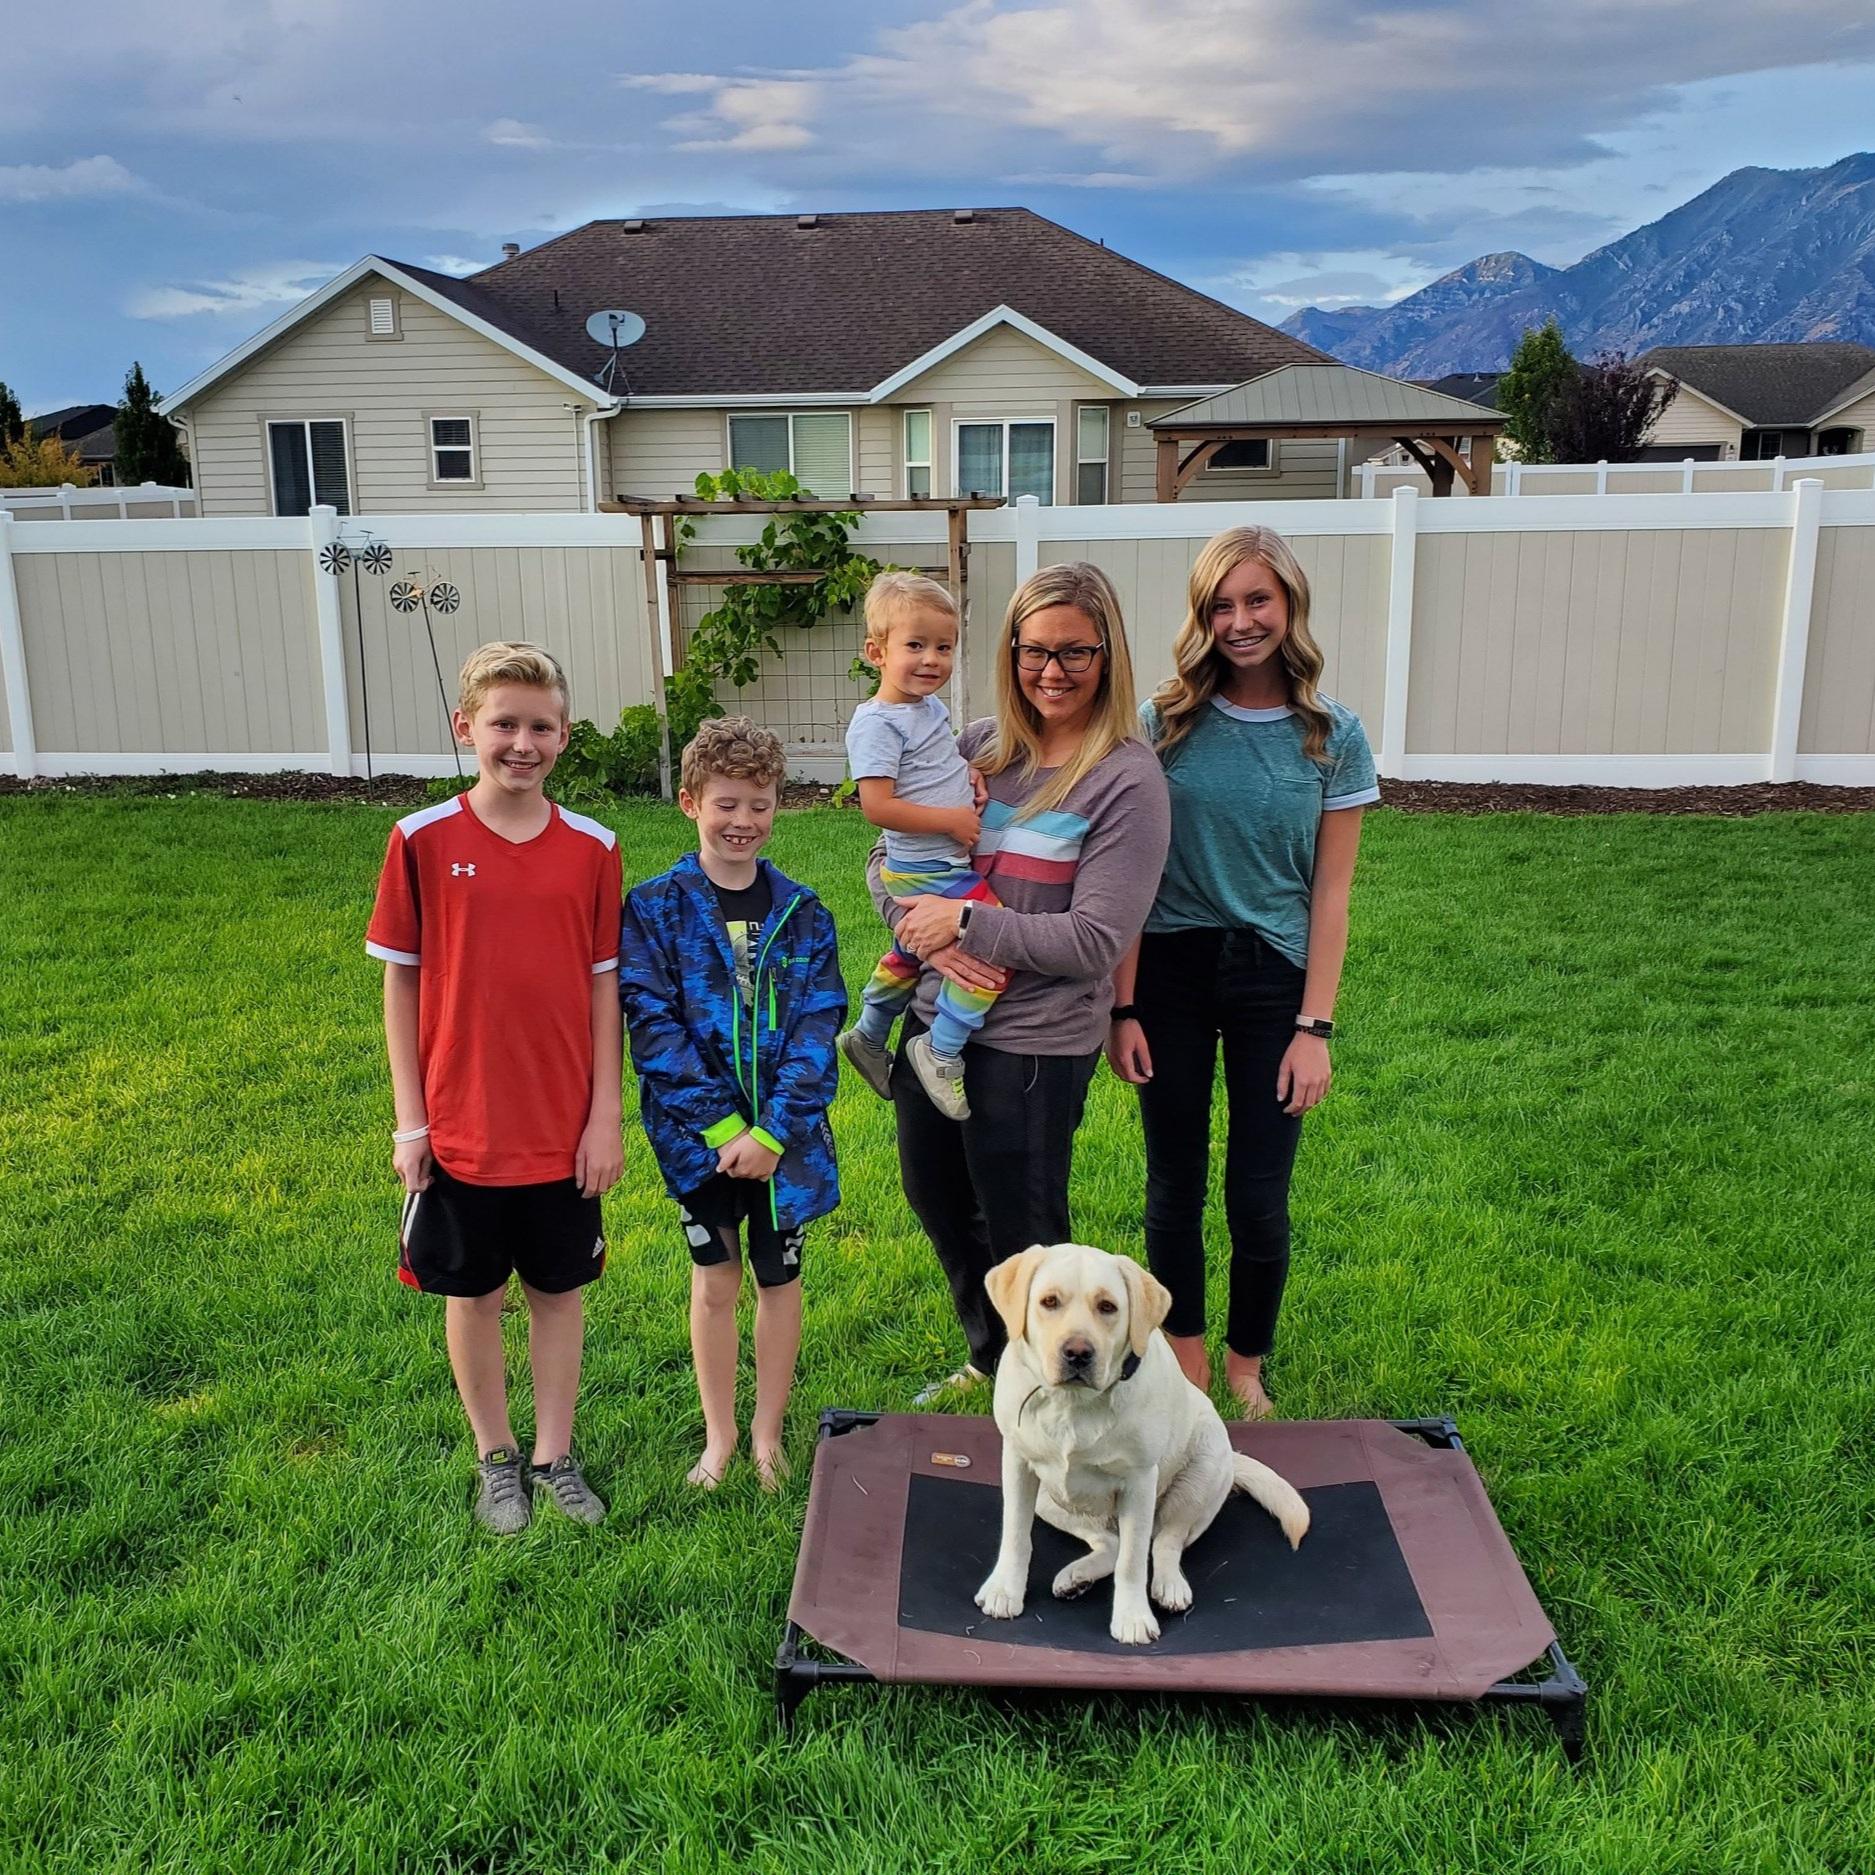 Dog Training for the Whole Family | Spanish Fork, UT | Bakers Acres K9 Academy